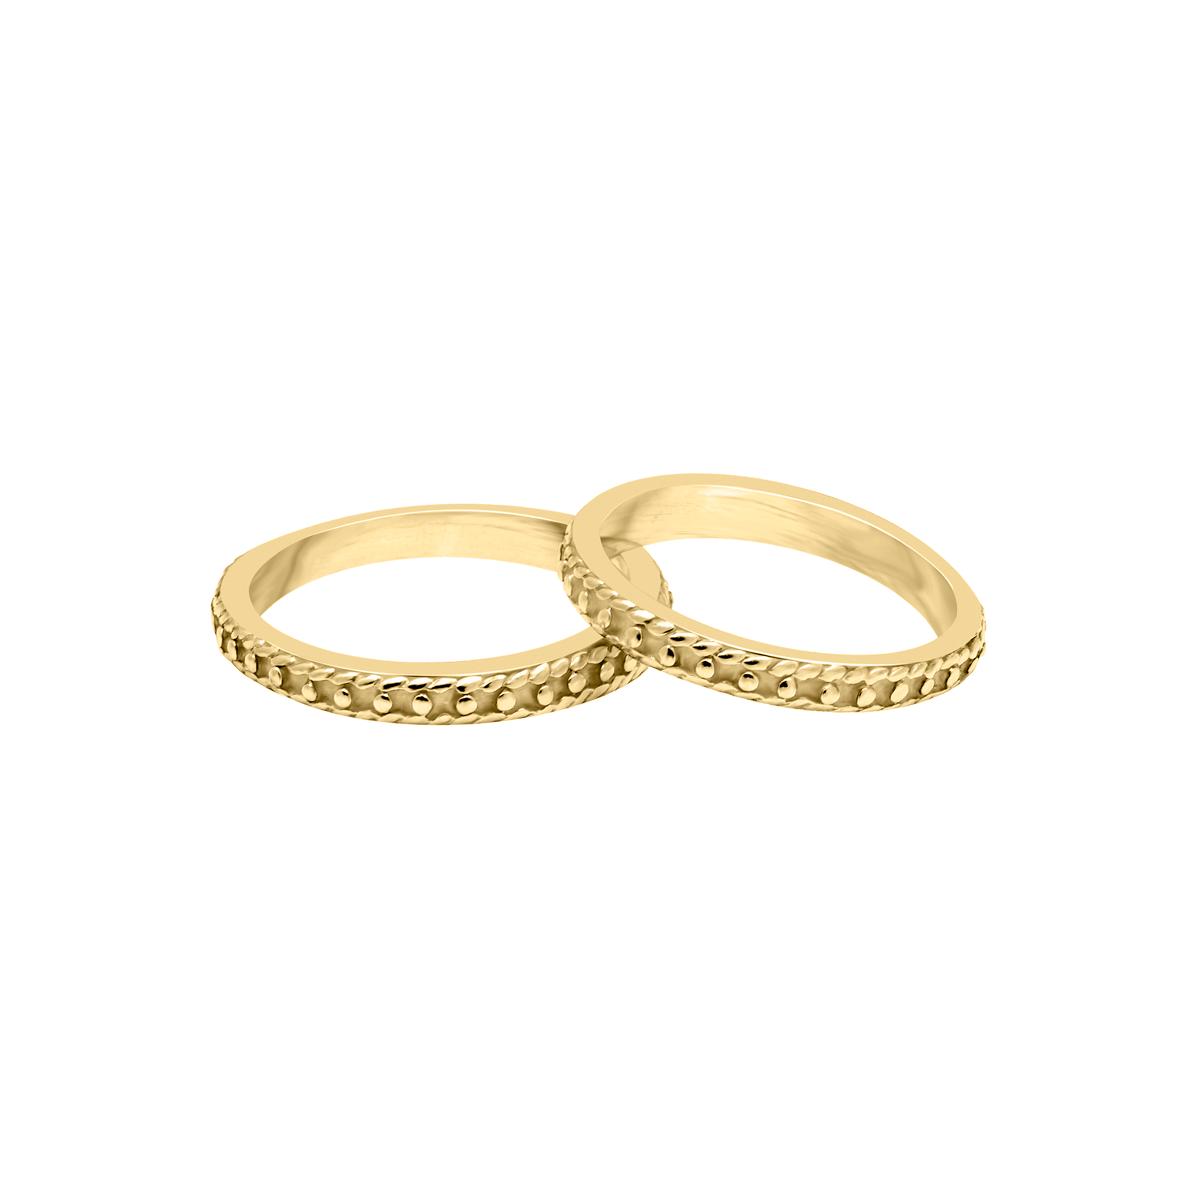 120affaba556 Alianzas en oro amarillo 18 kt con textura de perlitas - Sarah Kosta